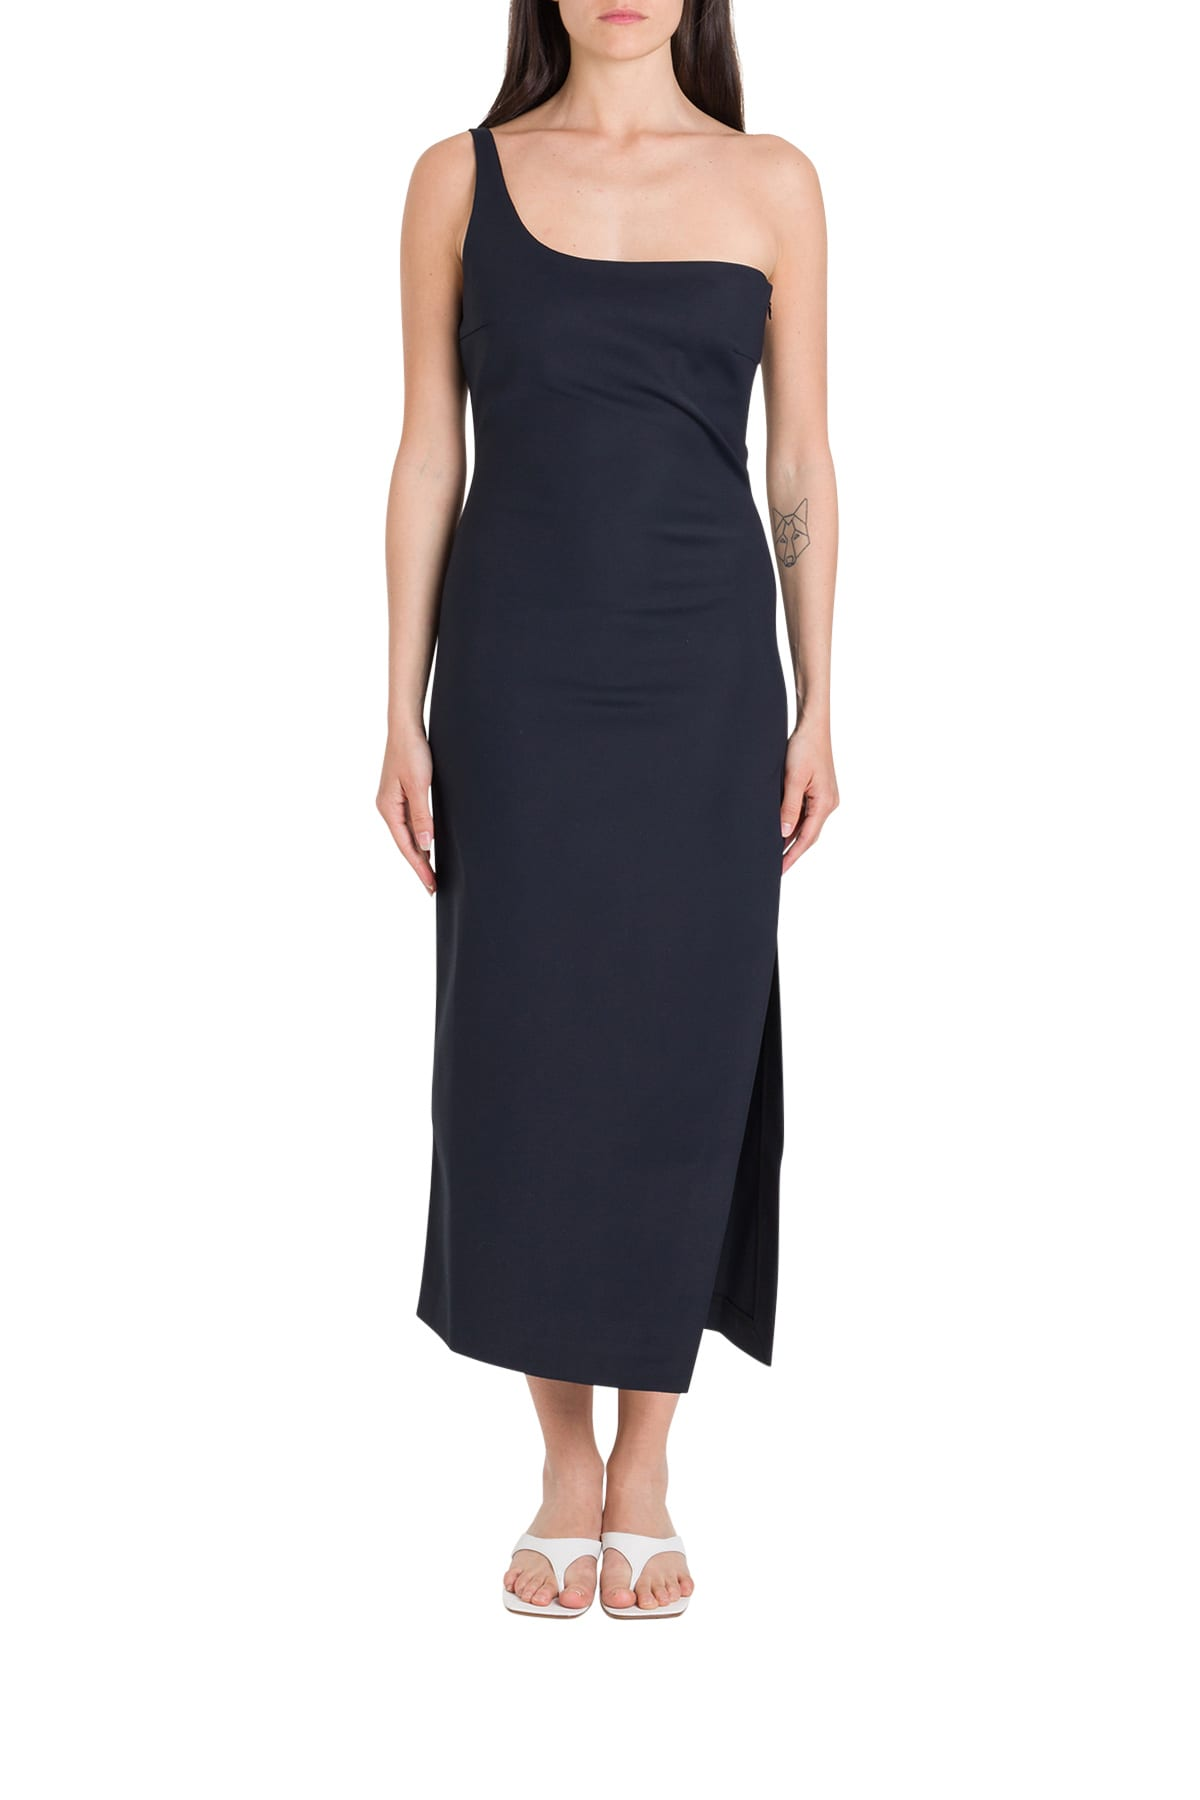 Buy Coperni One-shoulder Dress online, shop Coperni with free shipping